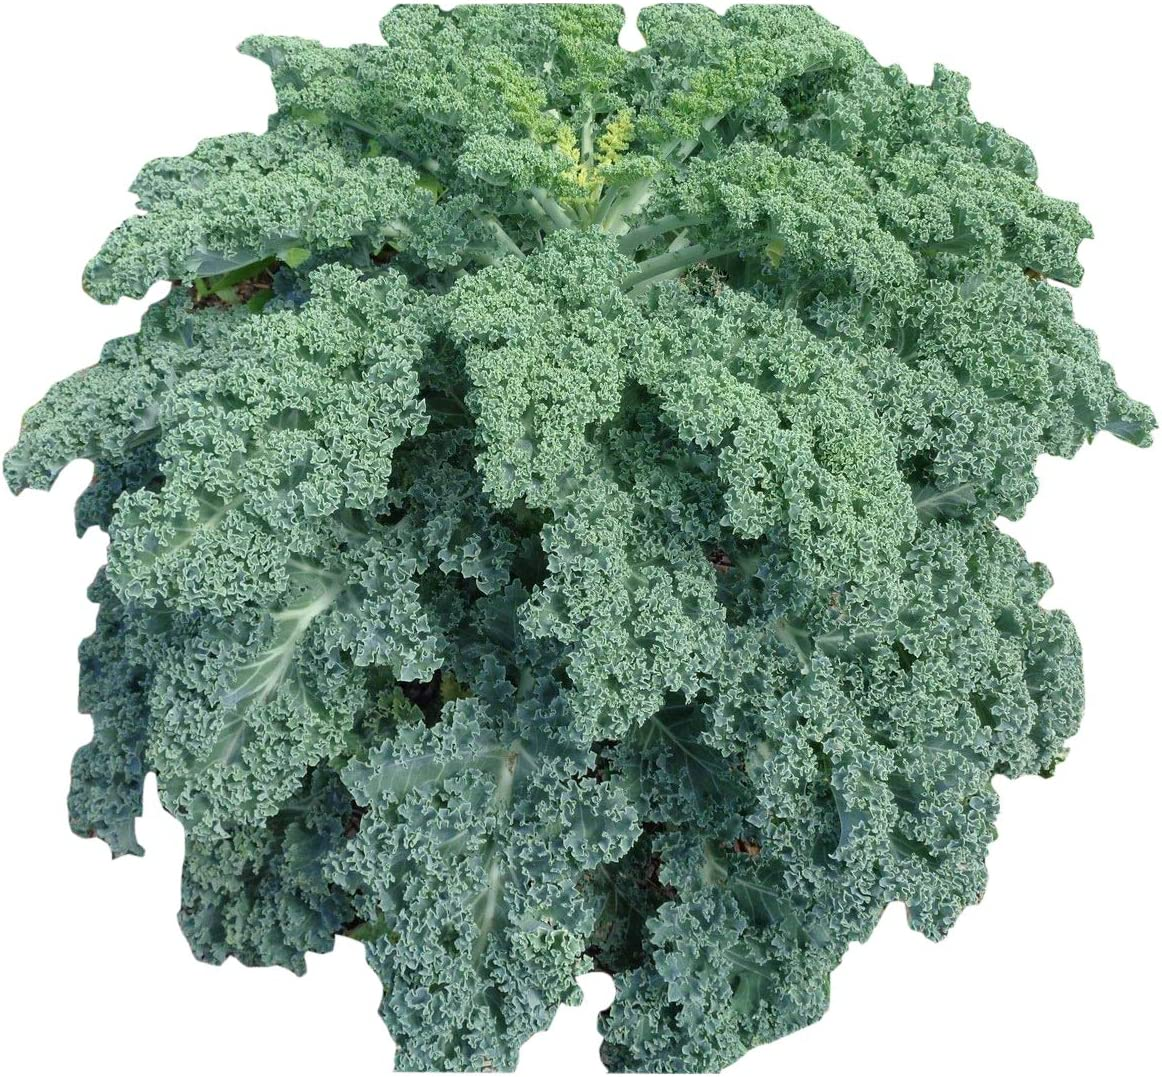 100PCS Dwarf Blue Curled Kale Seed Garden Organic Vegetable Seeds